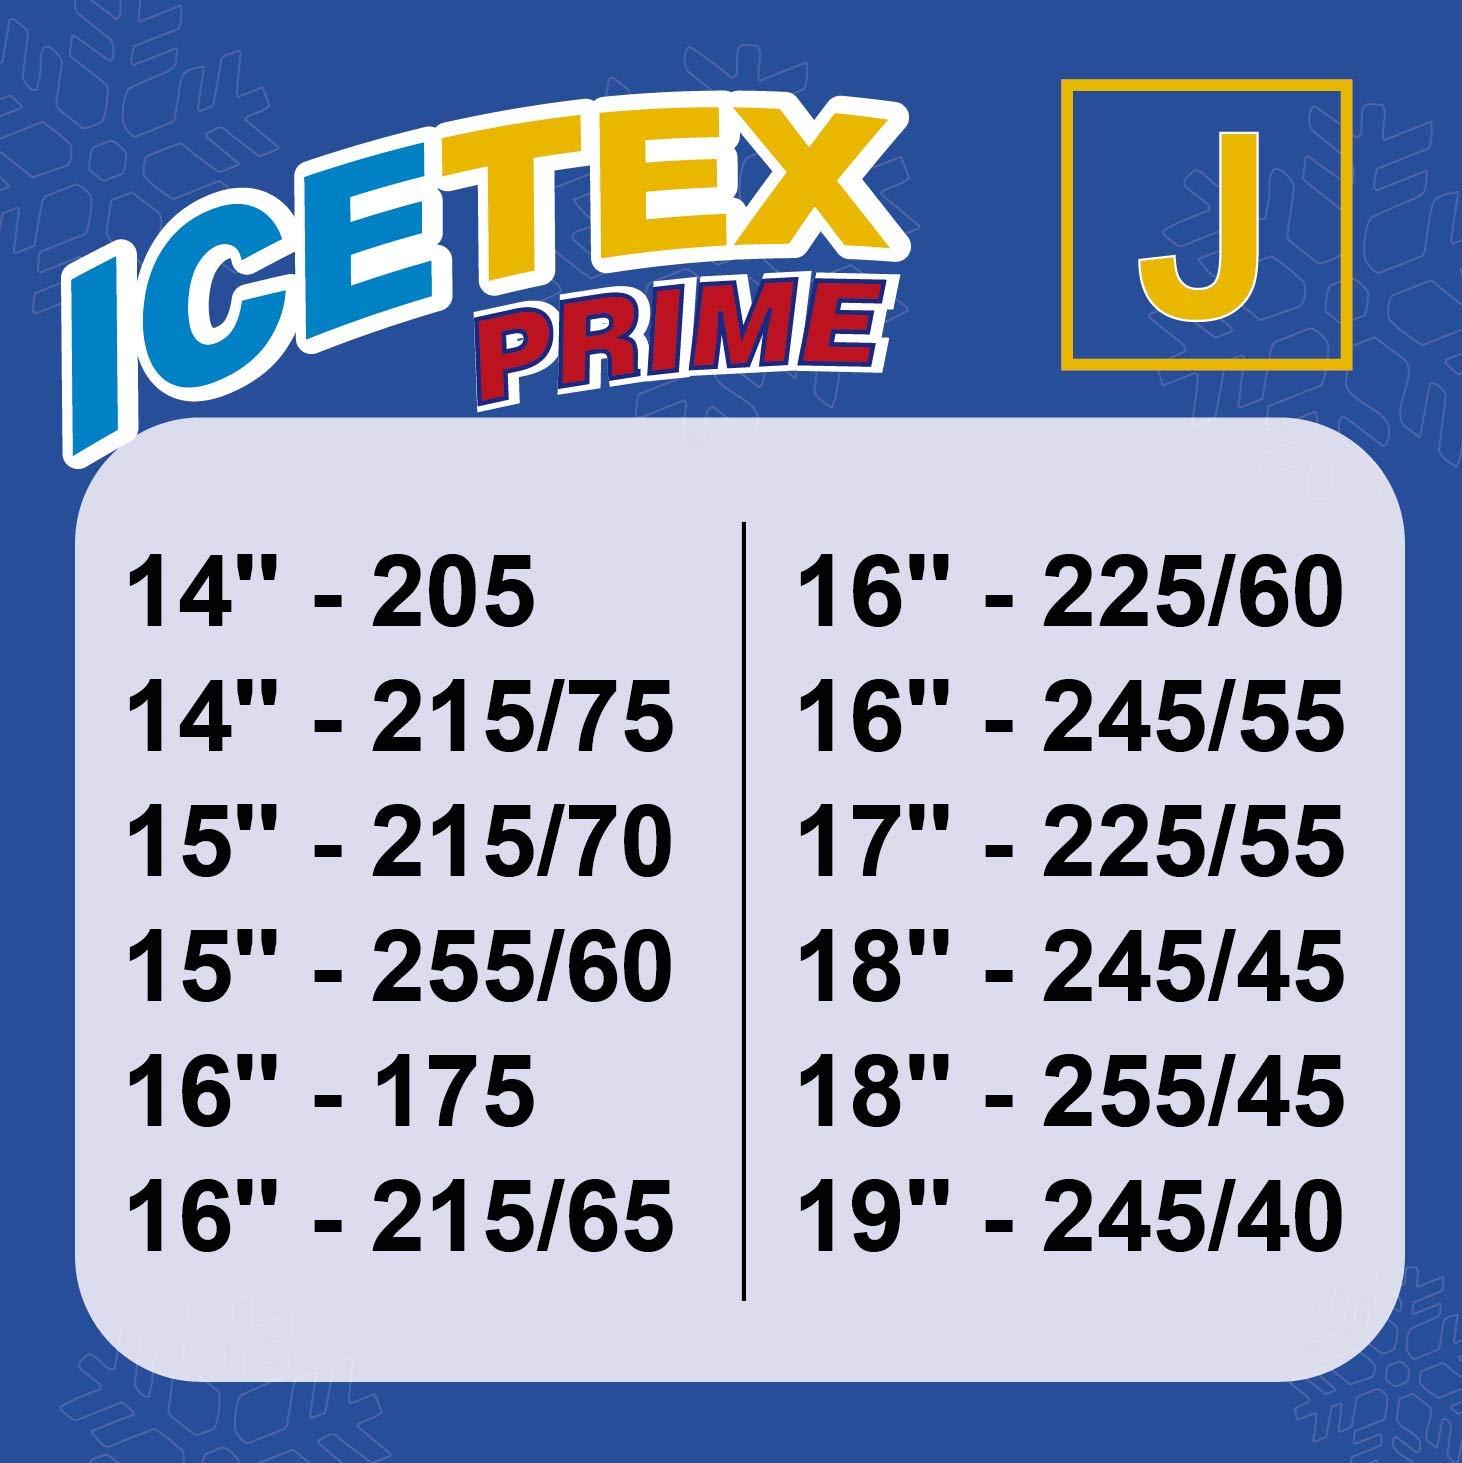 ICETEX PRIME Talla B AZ.3405.0051801 Fundas Antideslizantes//Cadenas Textiles para la Nieve